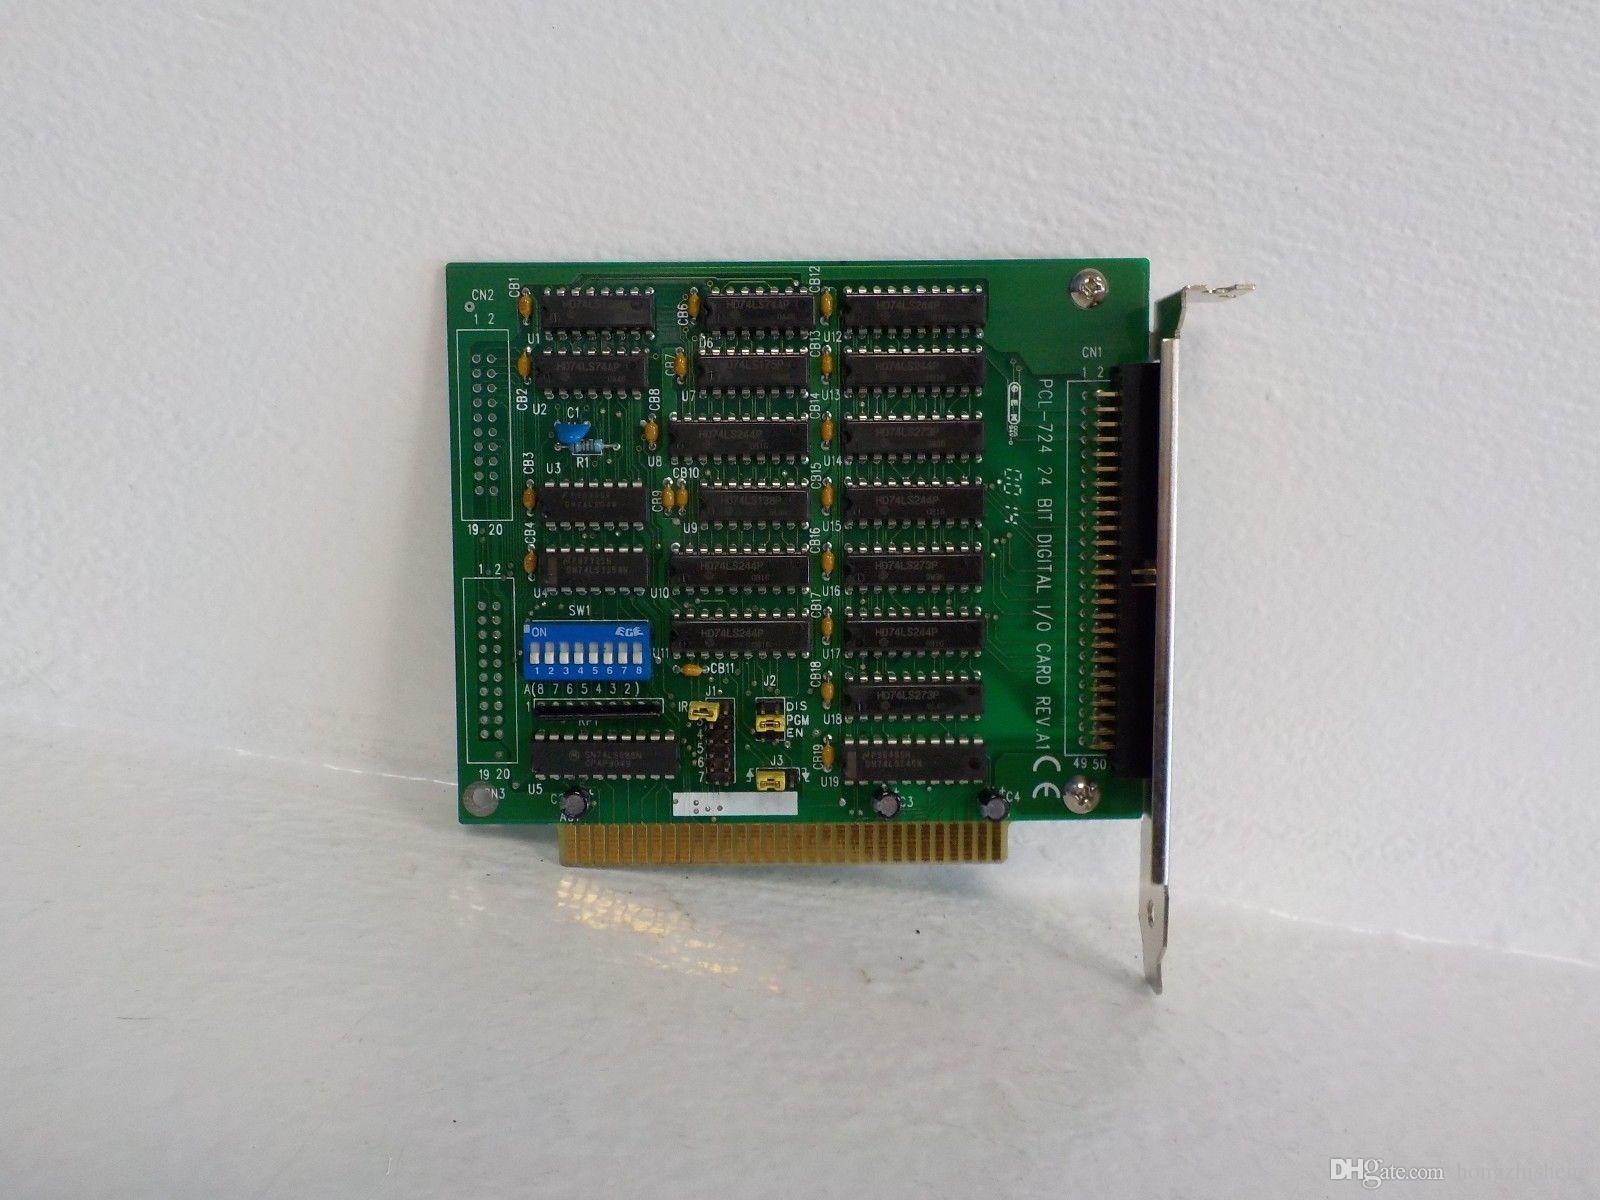 Доска PCL-724 промышленных оборудований 24 карточки IO бита цифровых REV.A1